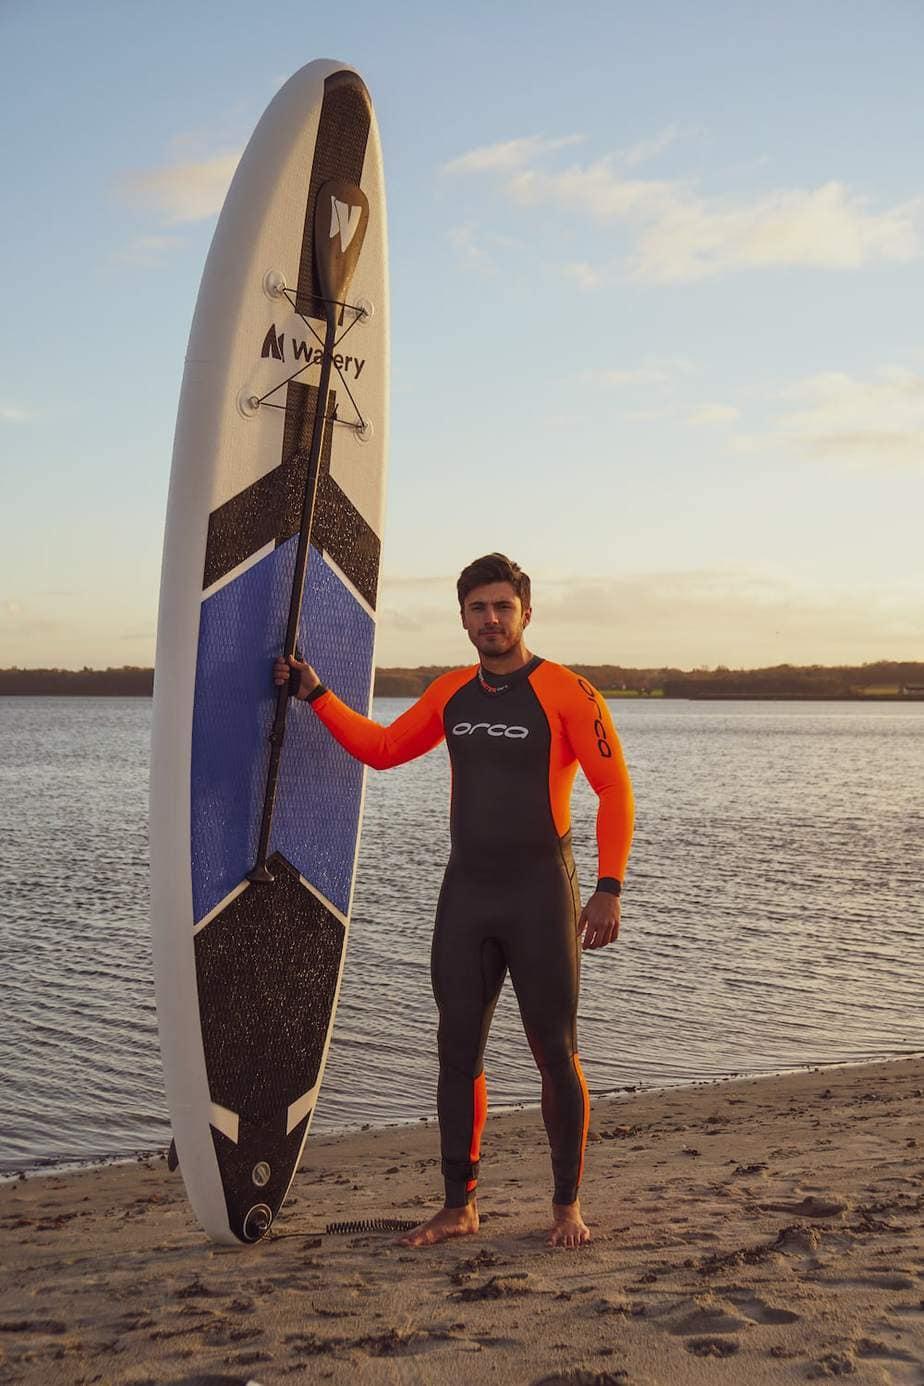 Watery_Global_Paddleboard_-_Blå